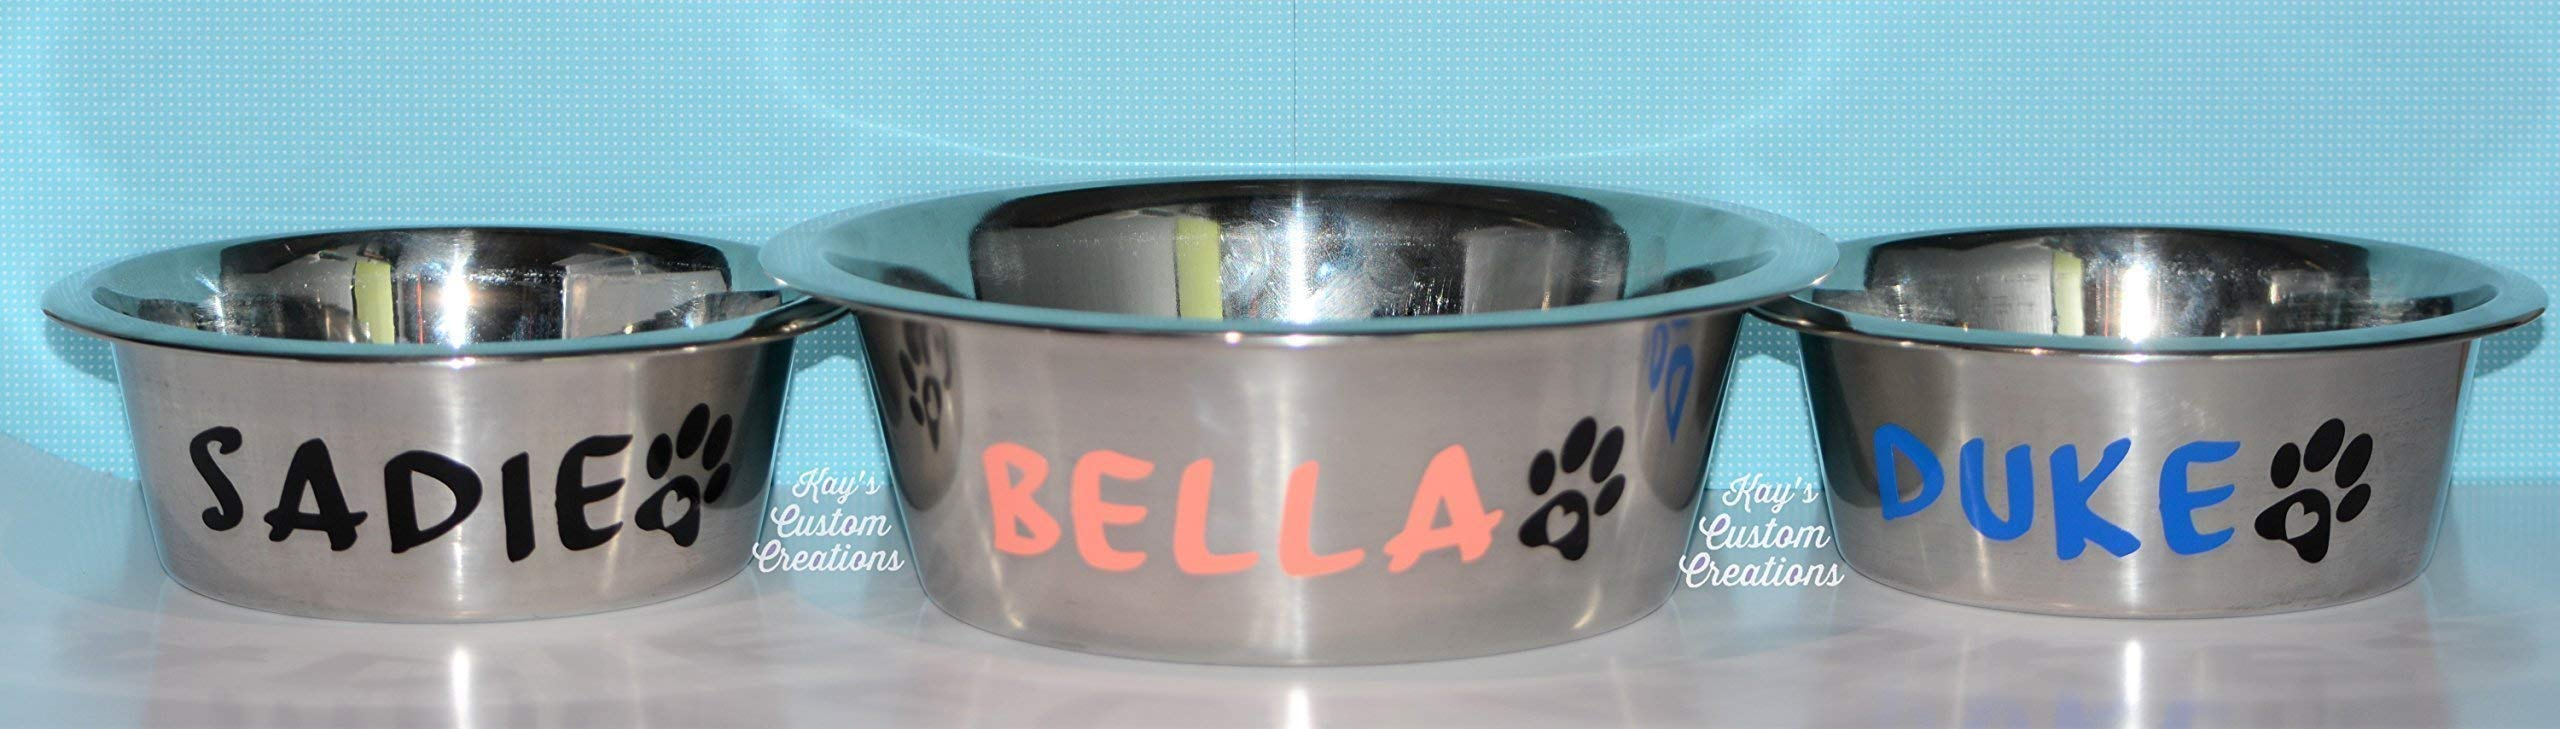 Custom Stainless Steel Pet Bowls